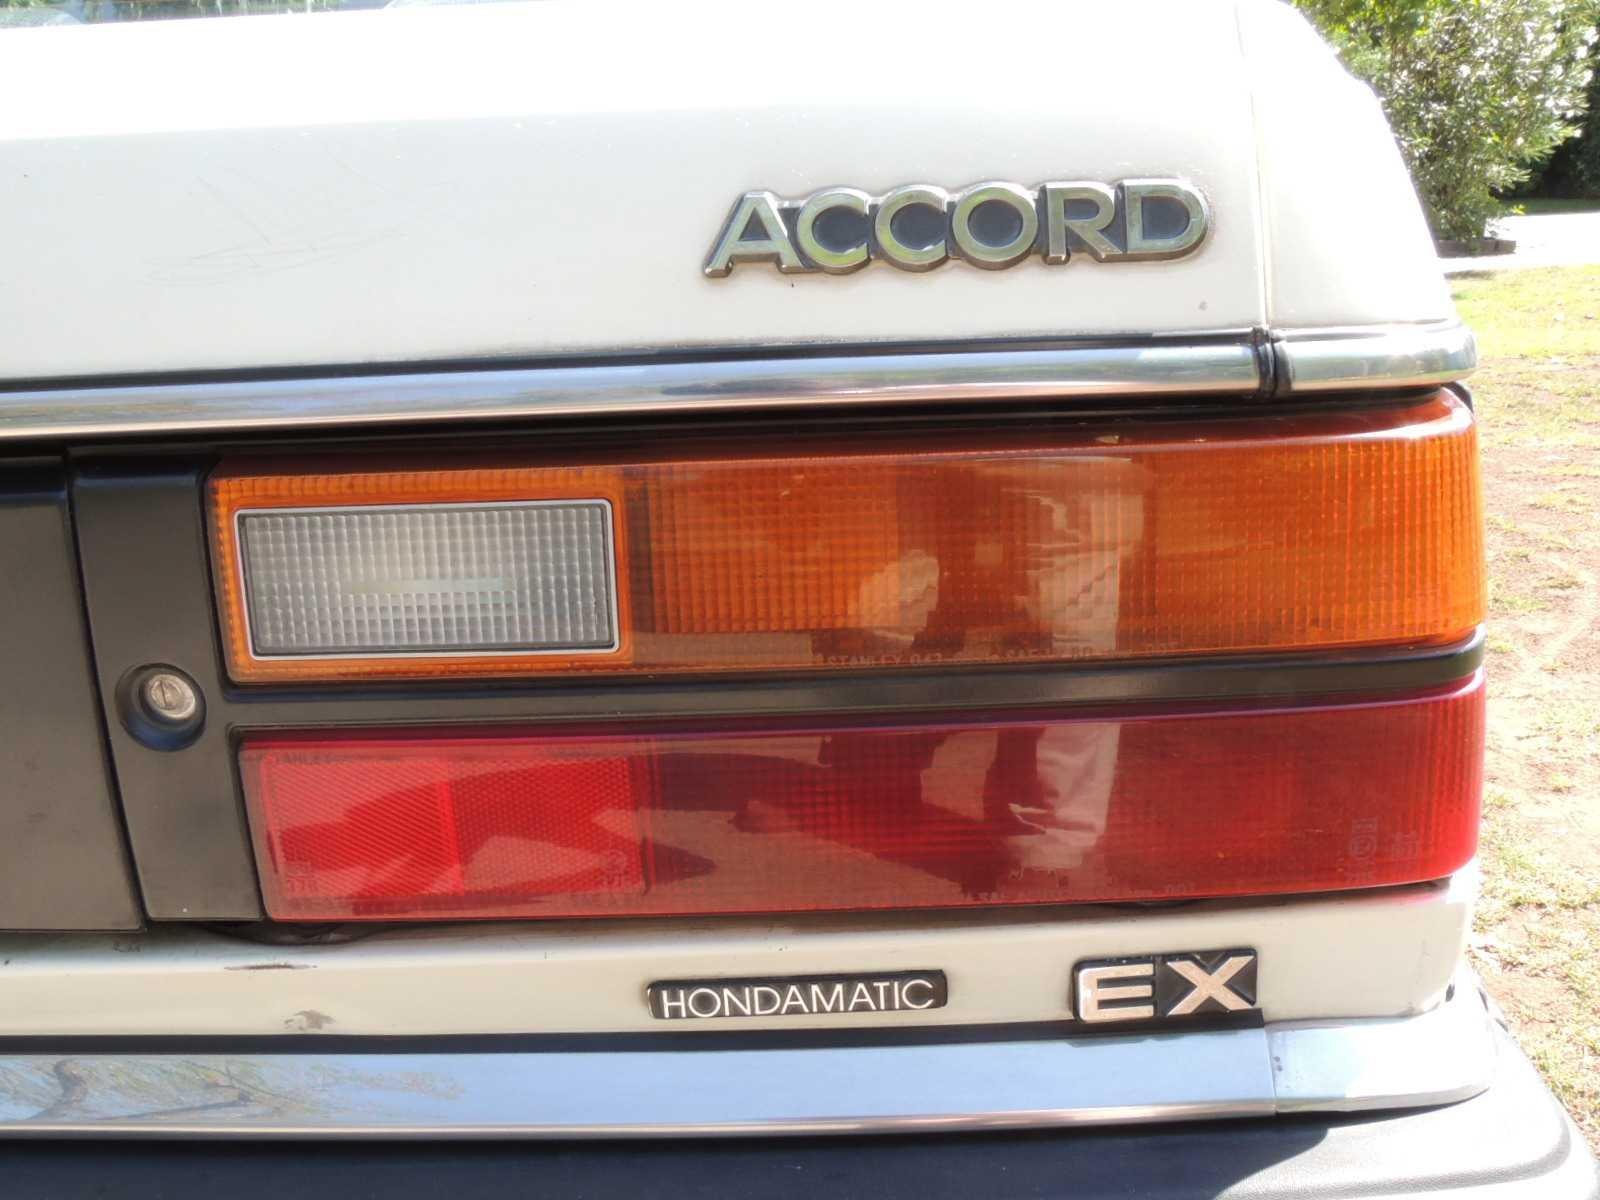 Honda Accord 1.6 EX Hondamatic 1983 Rutamotor Clásicos (35)